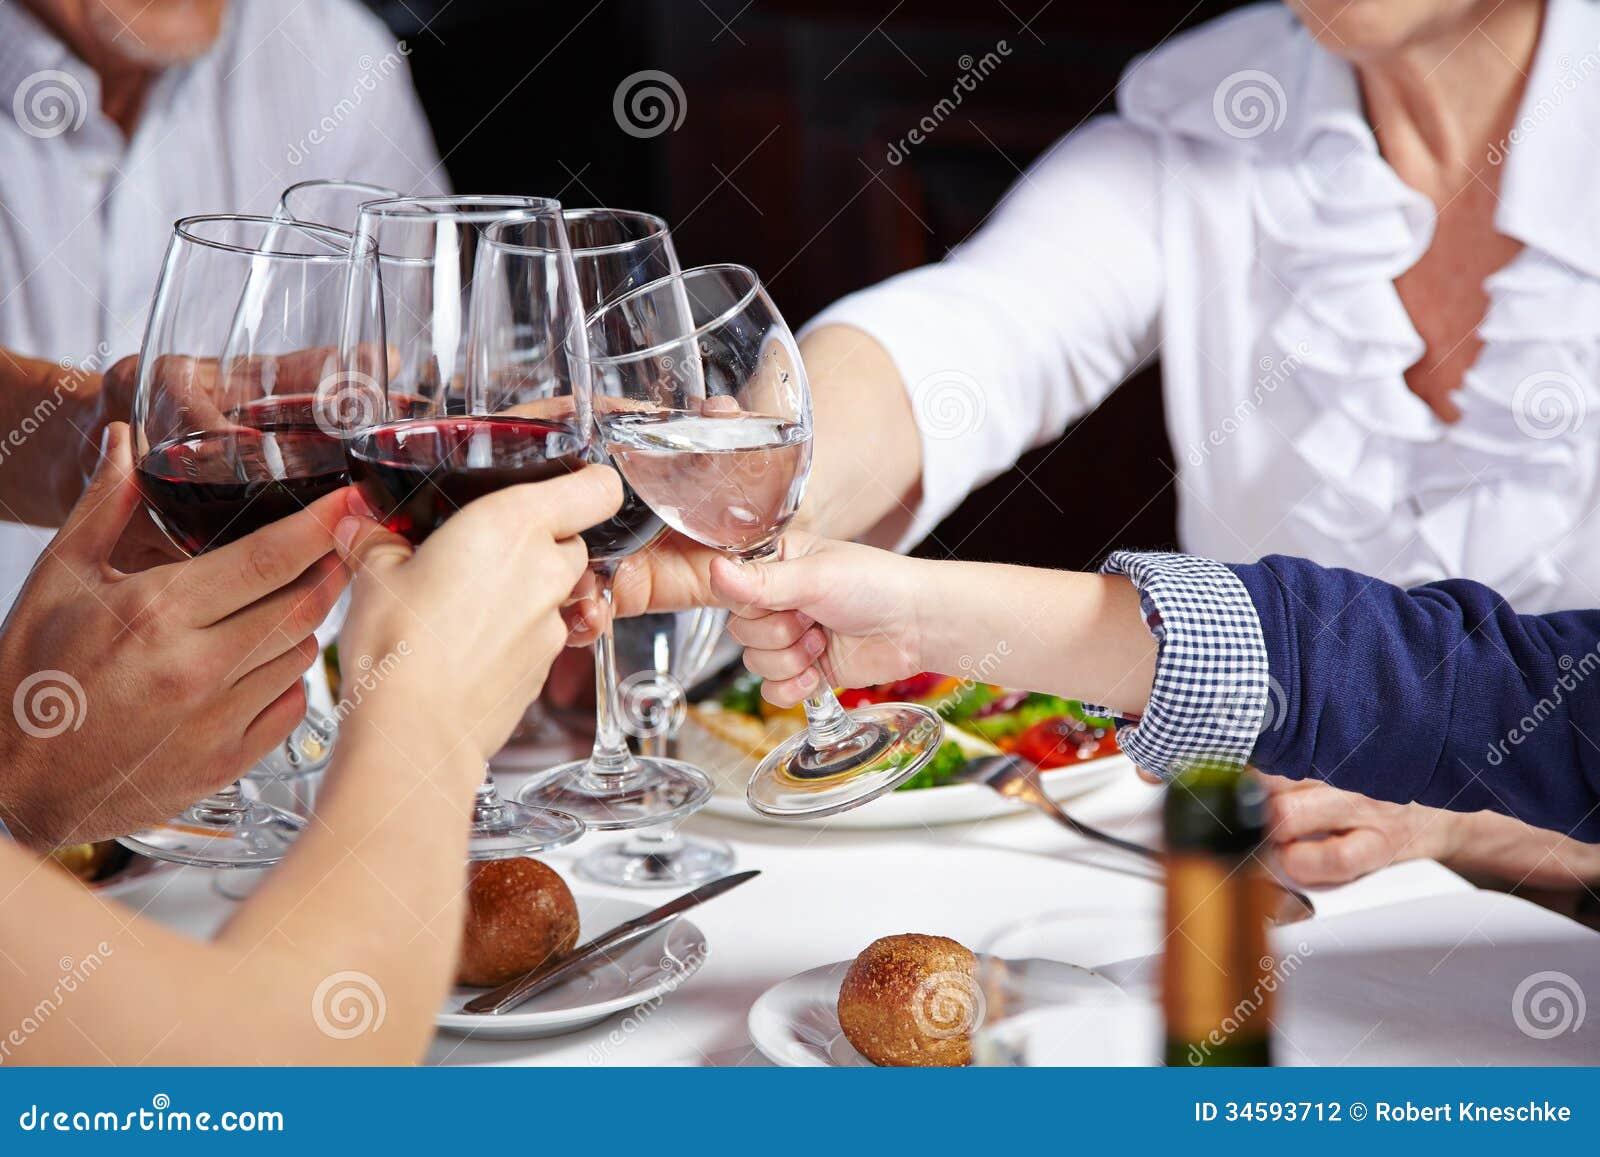 [Image: friends-toasting-glasses-red-wine-restau...593712.jpg]